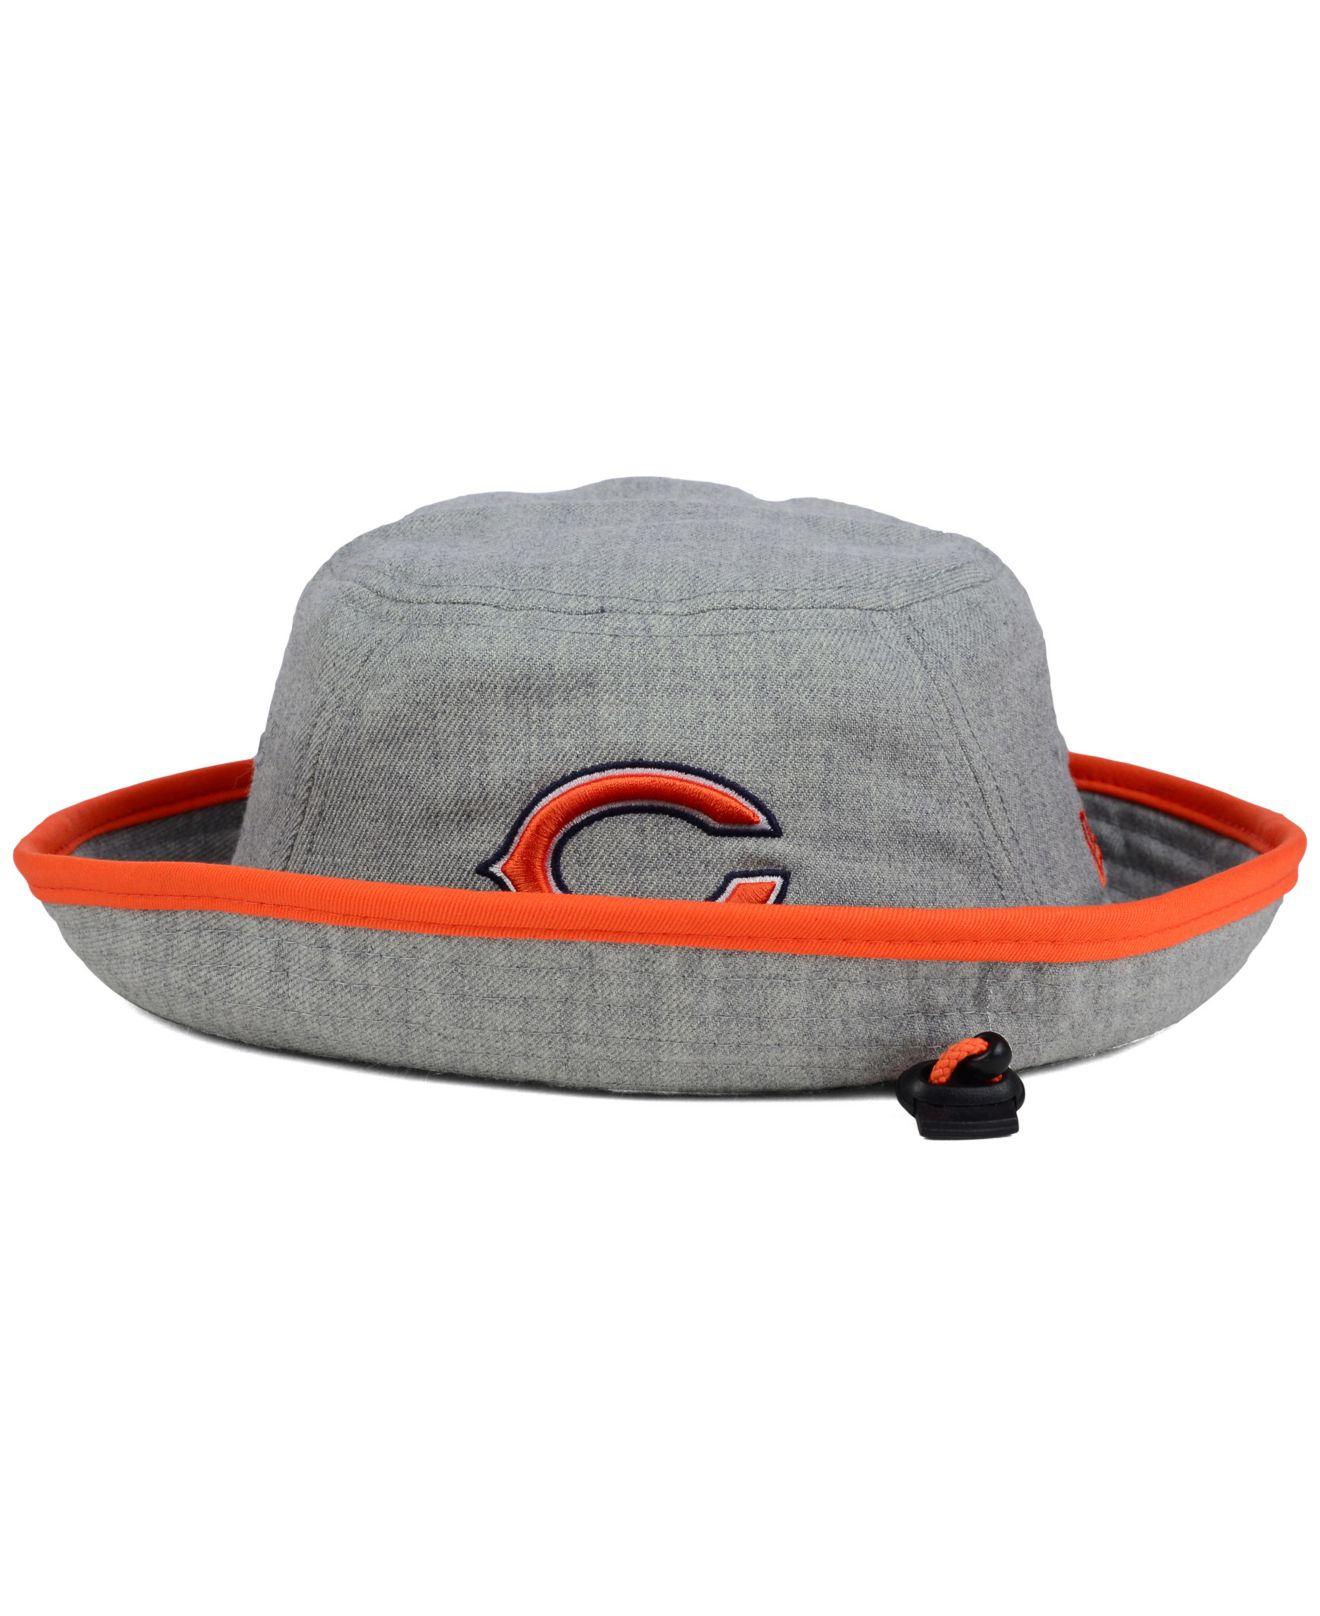 b29b77b1ded Lyst - KTZ Chicago Bears Nfl Heather Gray Bucket Hat in Gray for Men